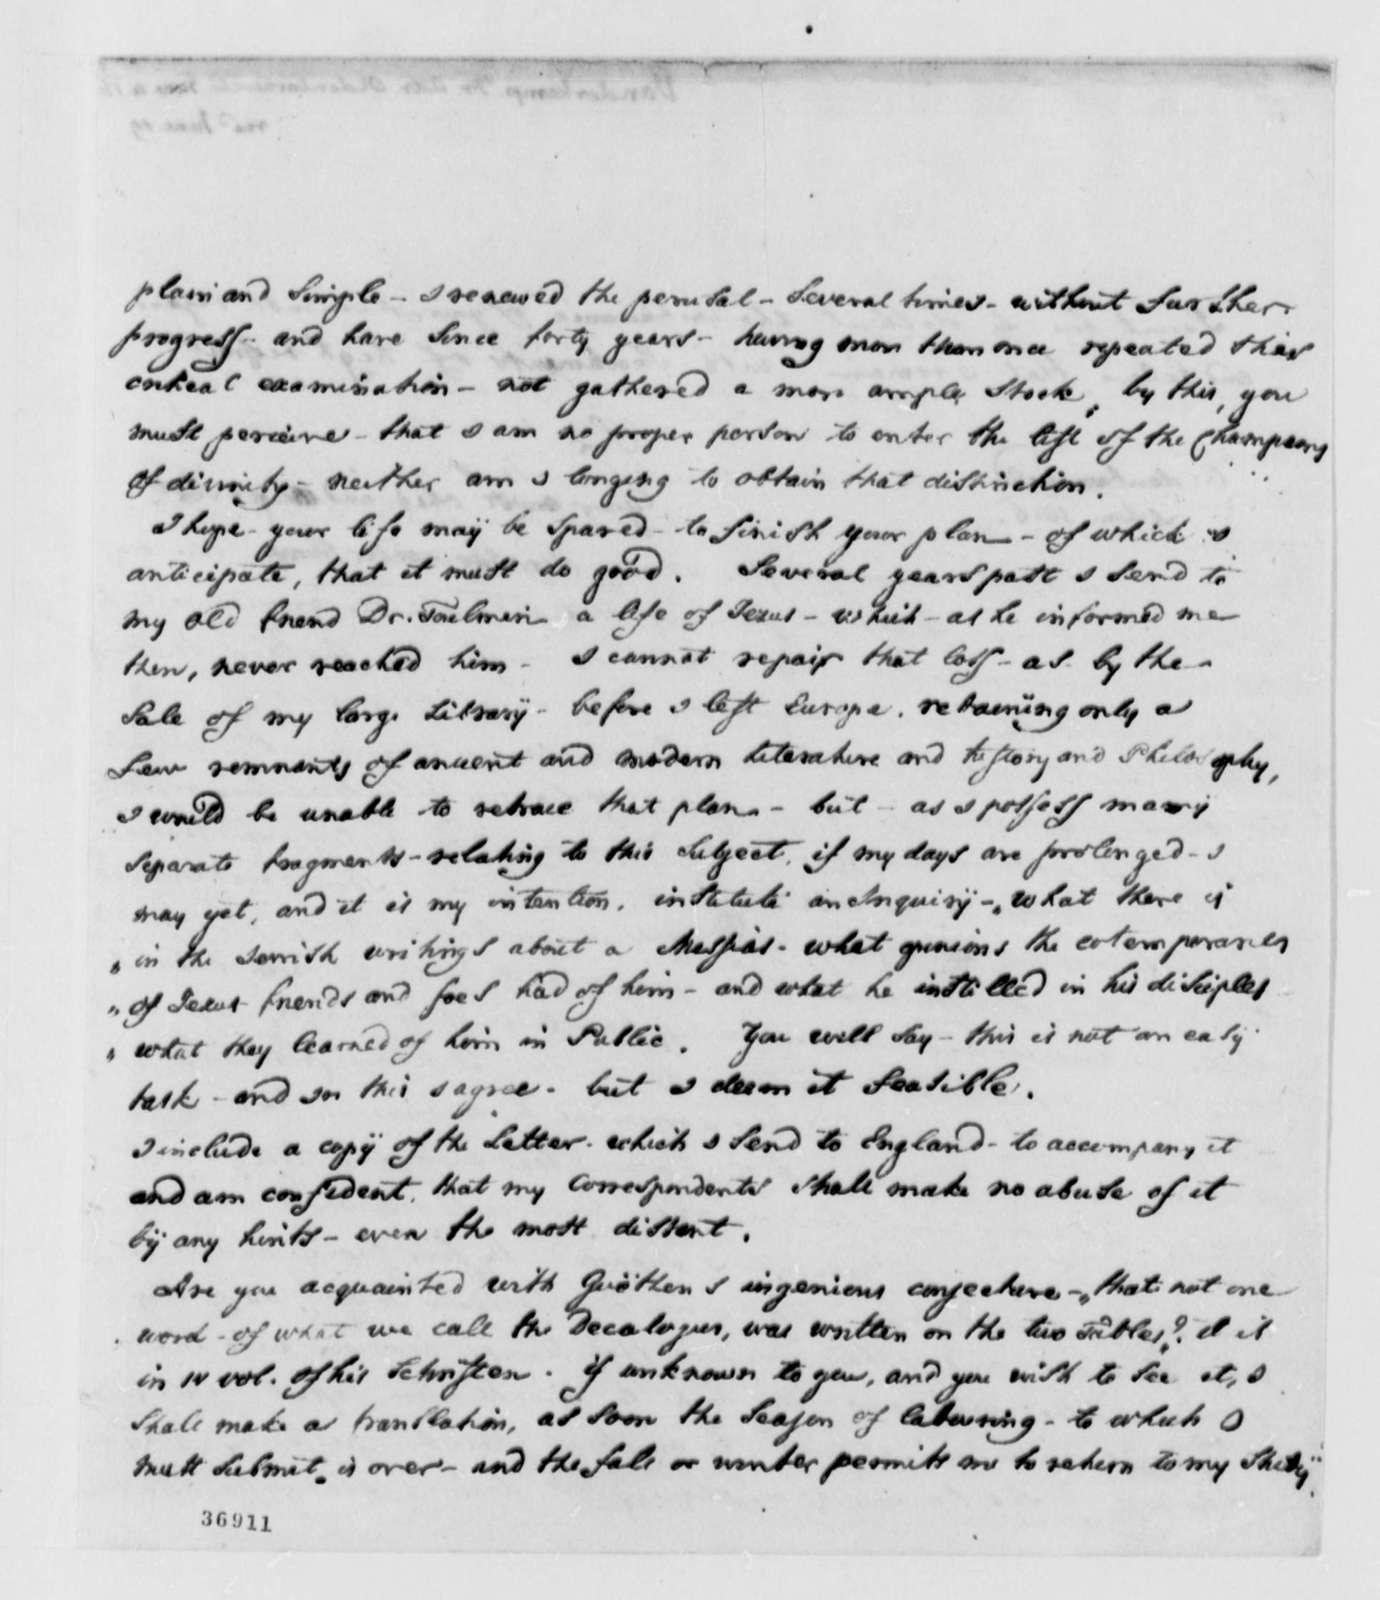 Francis A. van der Kemp to Thomas Jefferson, June 4, 1816